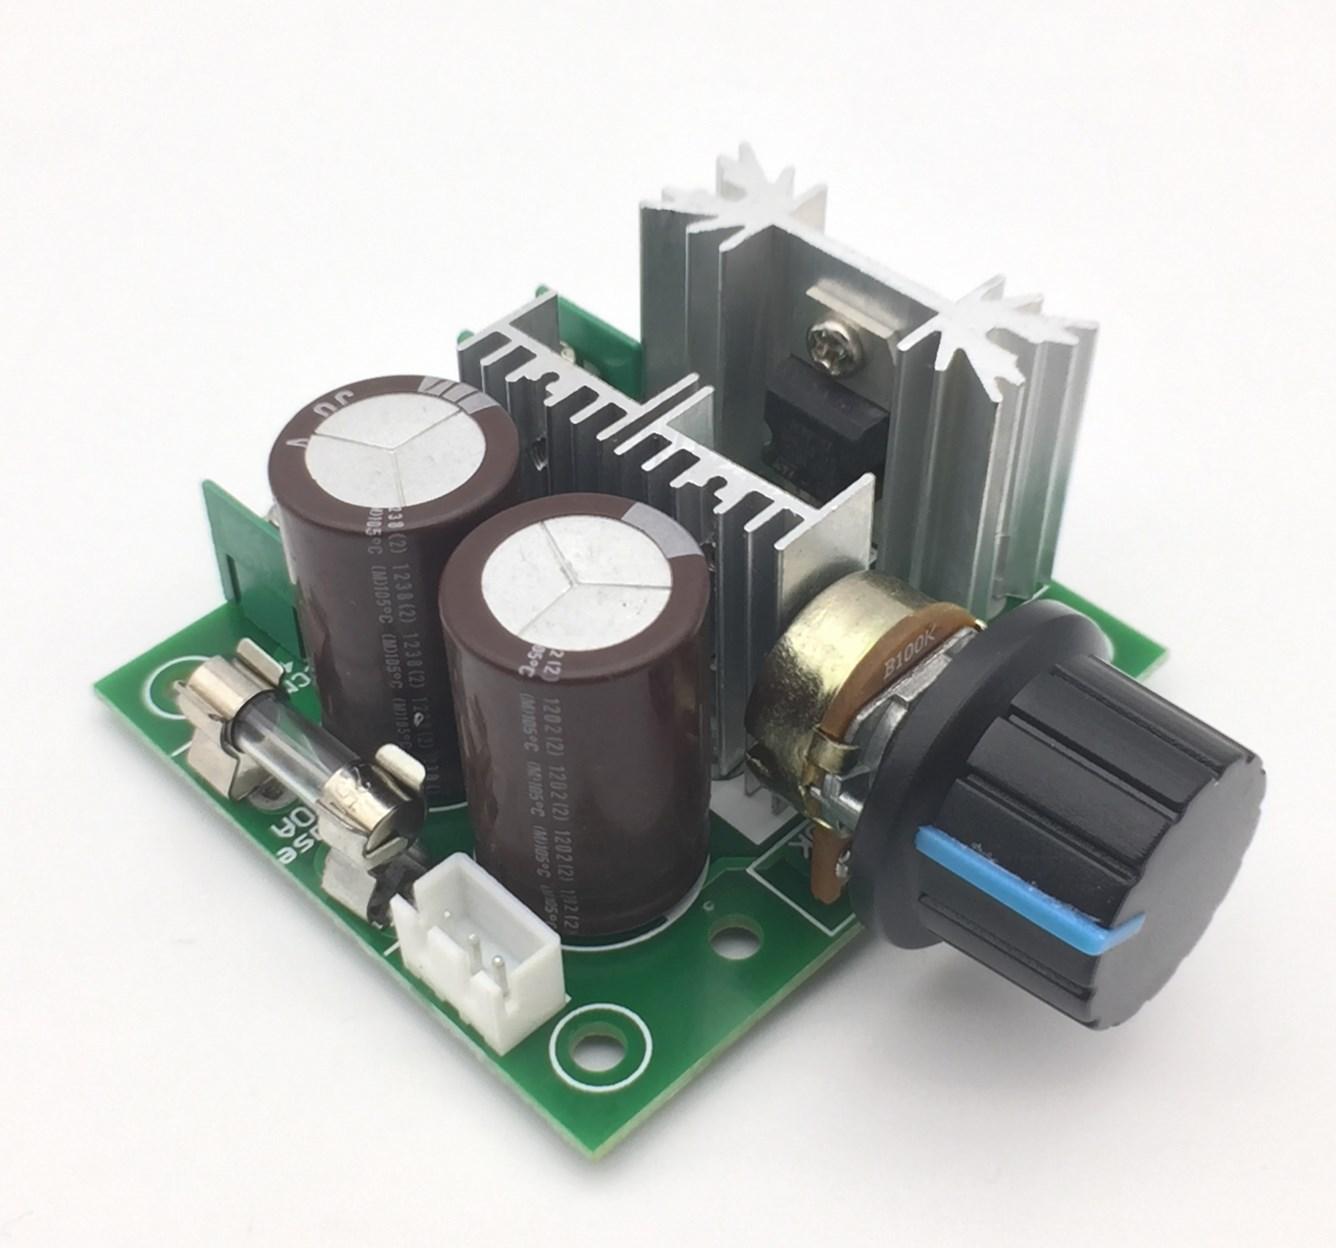 12V-40V 10A Pulse Width Modulation PWM DC Motor Speed Control Switch USA